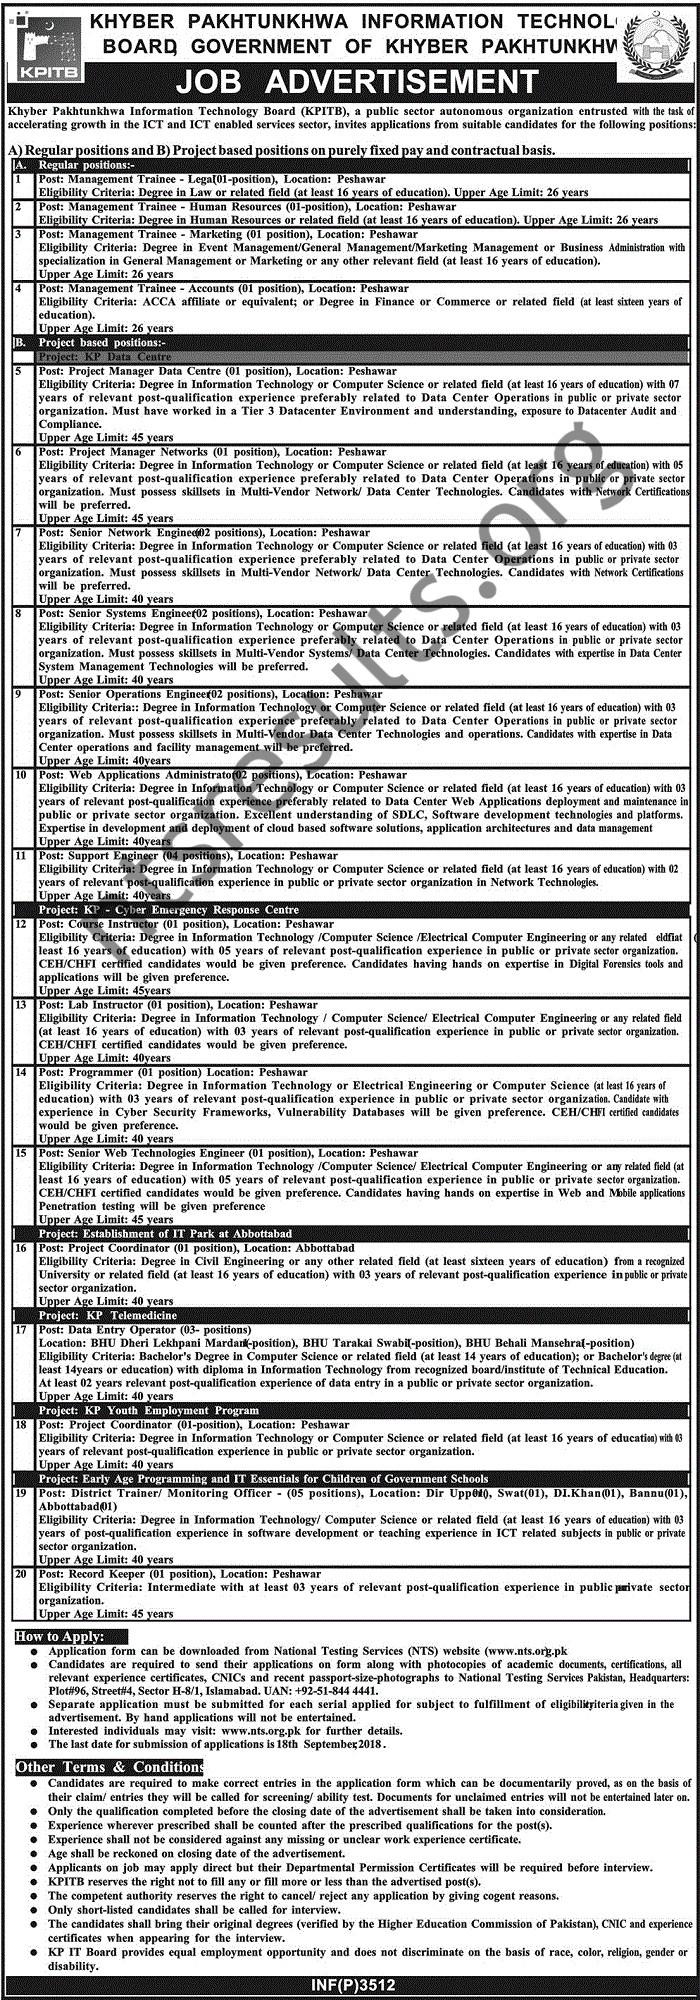 Khyber Pakhtunkhwa Information Technology Board Jobs Via NTS